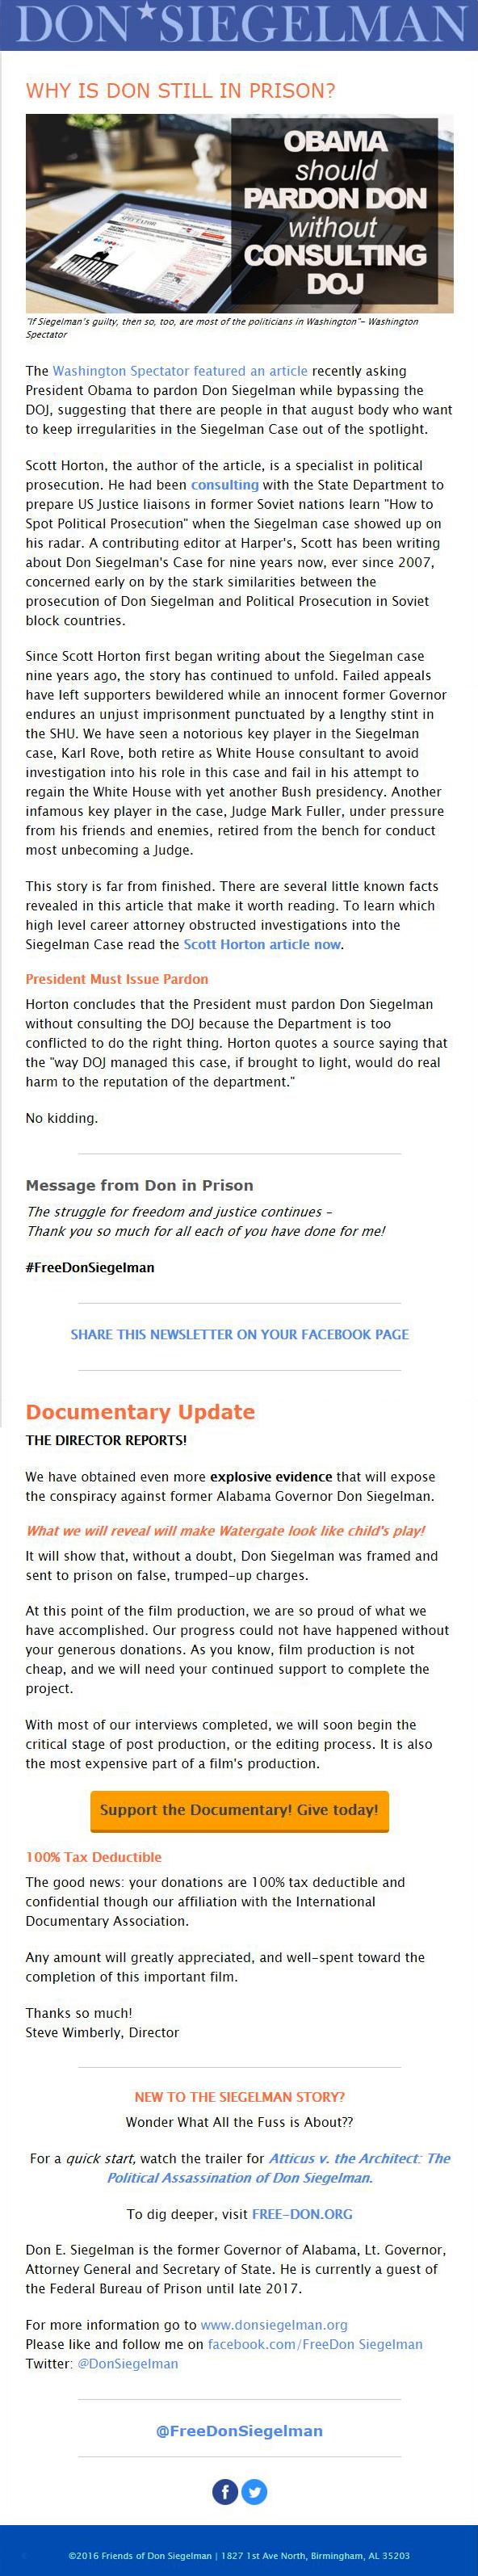 Siegelman-Obama-Pardon